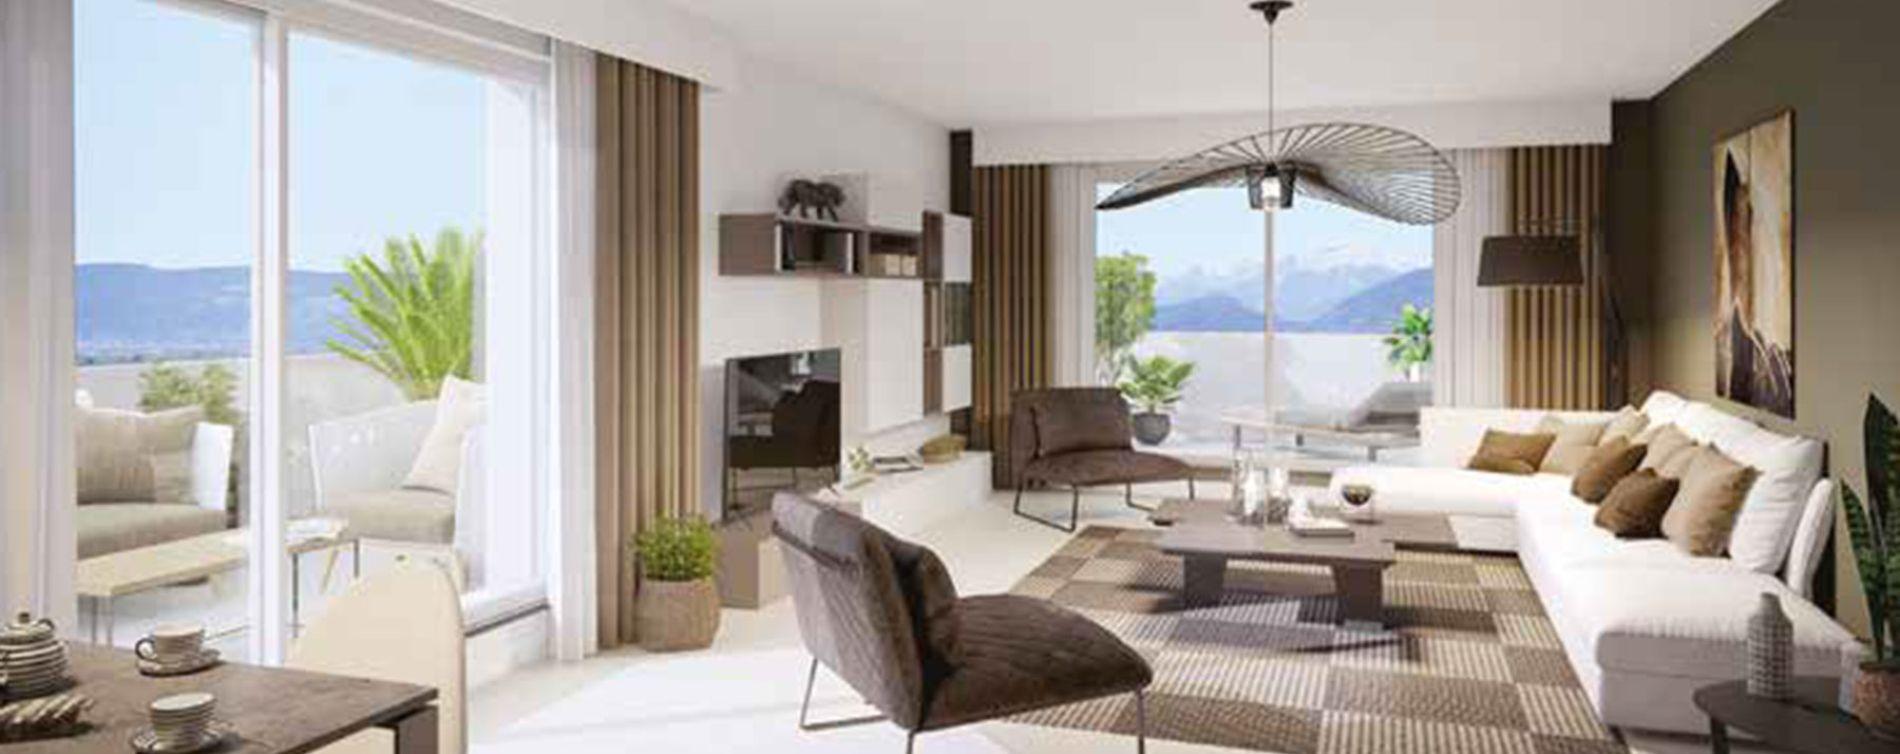 Saint-Genis-Pouilly : programme immobilier neuve « Atôm » (3)